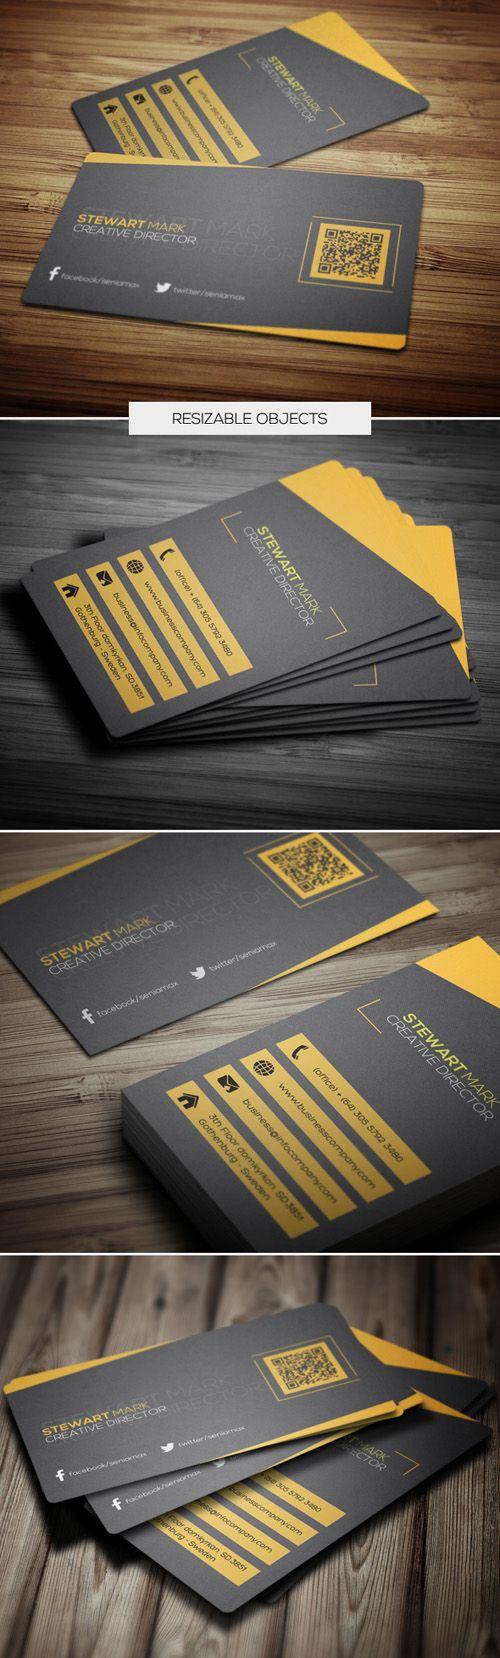 Creative Business Card Template #businesscards #businesscardsdesign #corporatebusinesscards